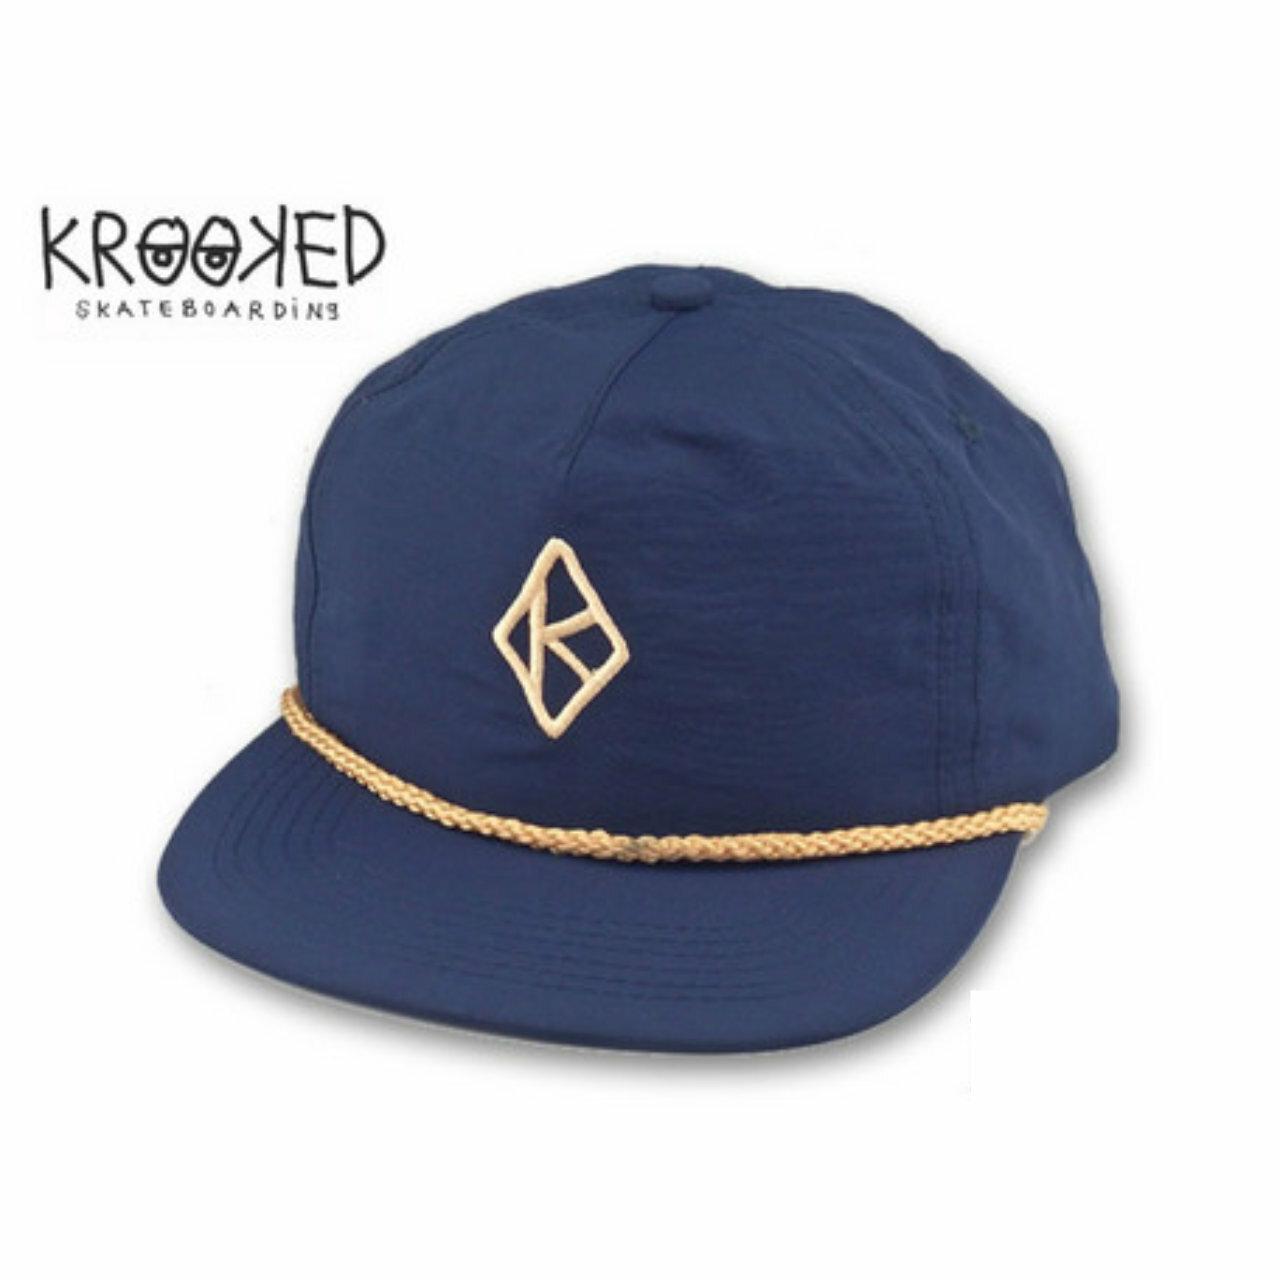 【KROOKED】 マークゴンザレス トミーゲレロ キャップ DIAMOND K 〈Navy〉